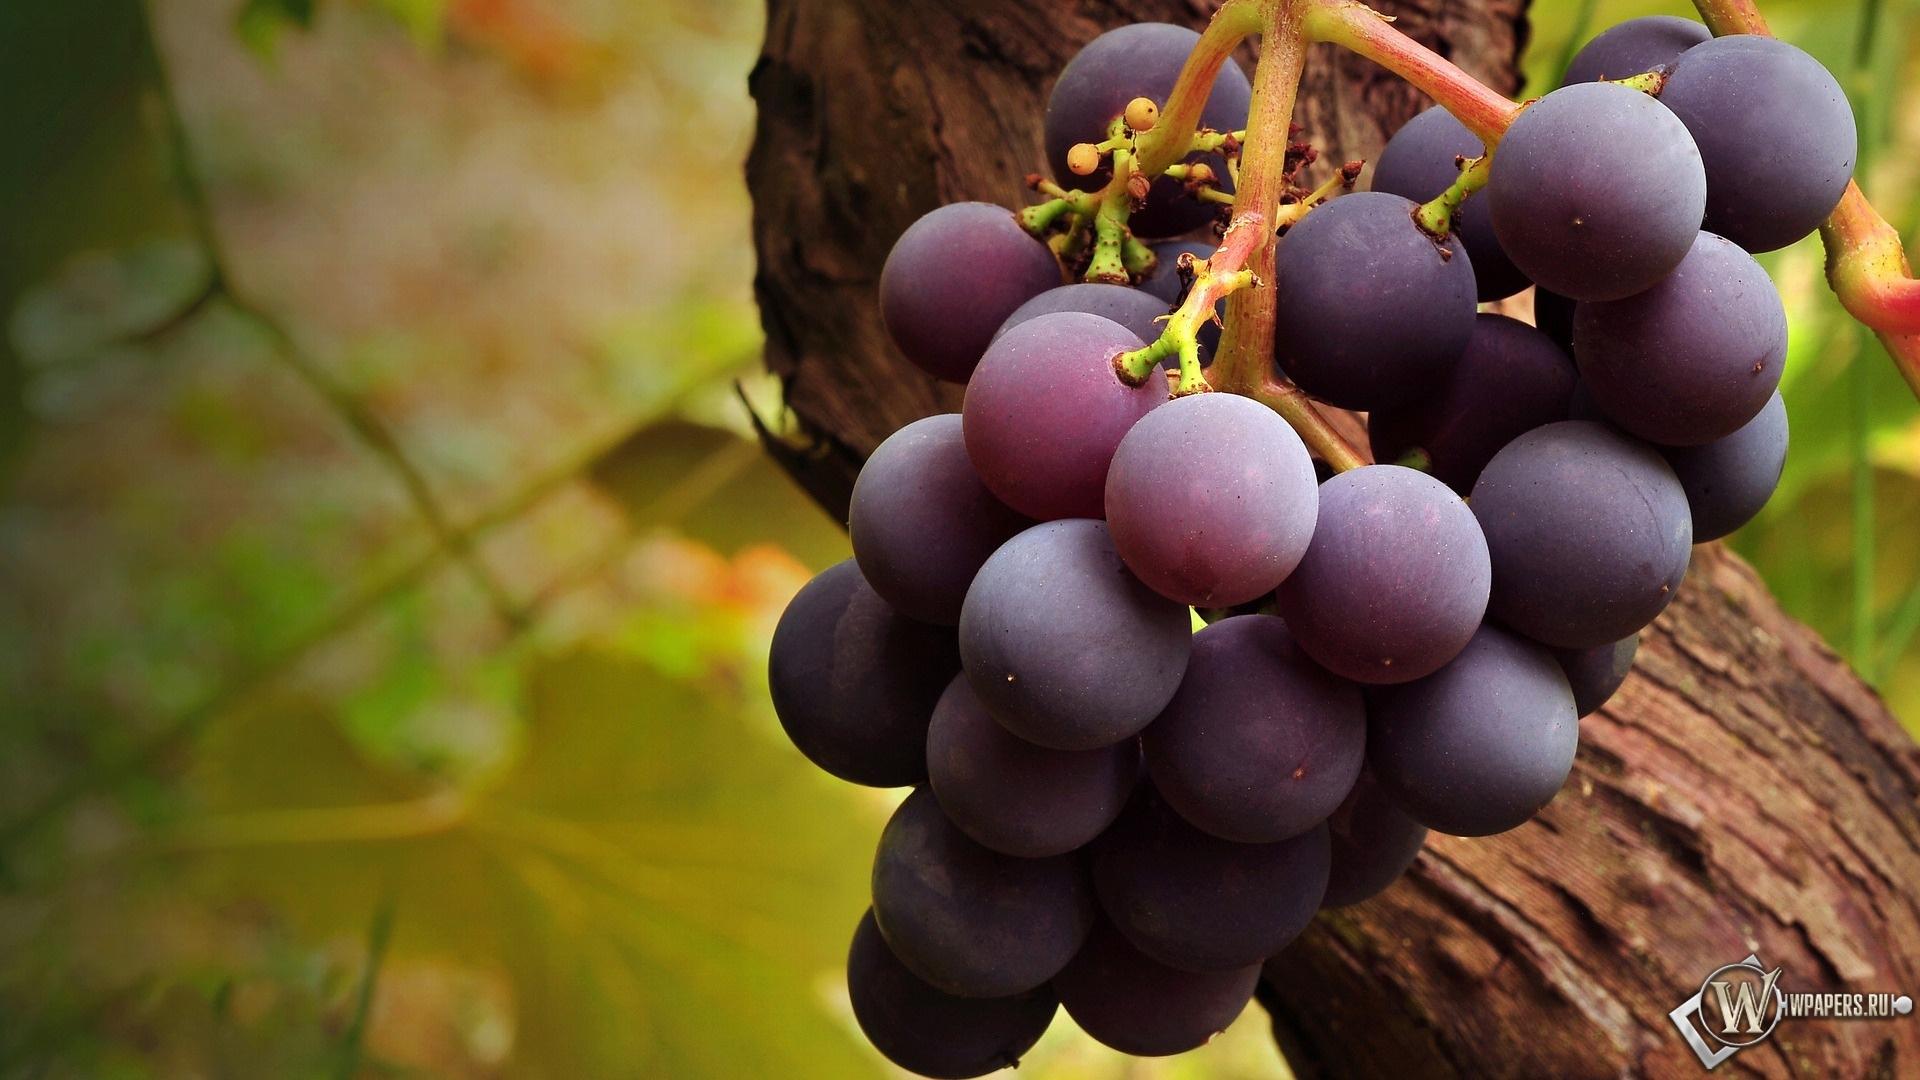 Вкусный виноград 1920x1080